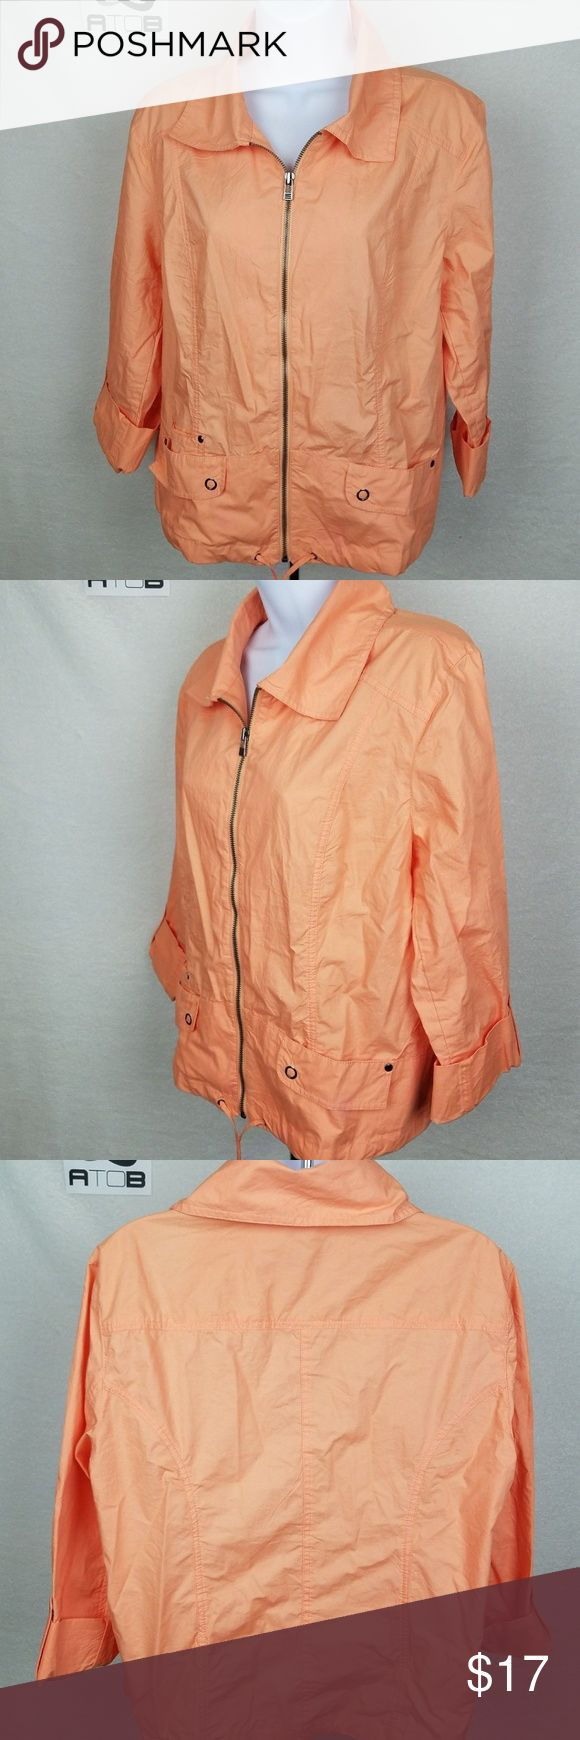 Chico's Womens Jacket Size 2 (Large)Active Light Chico's Womens Jacket Size 2 (Large)Active Light Orange - C9 Chico's Jackets & Coats